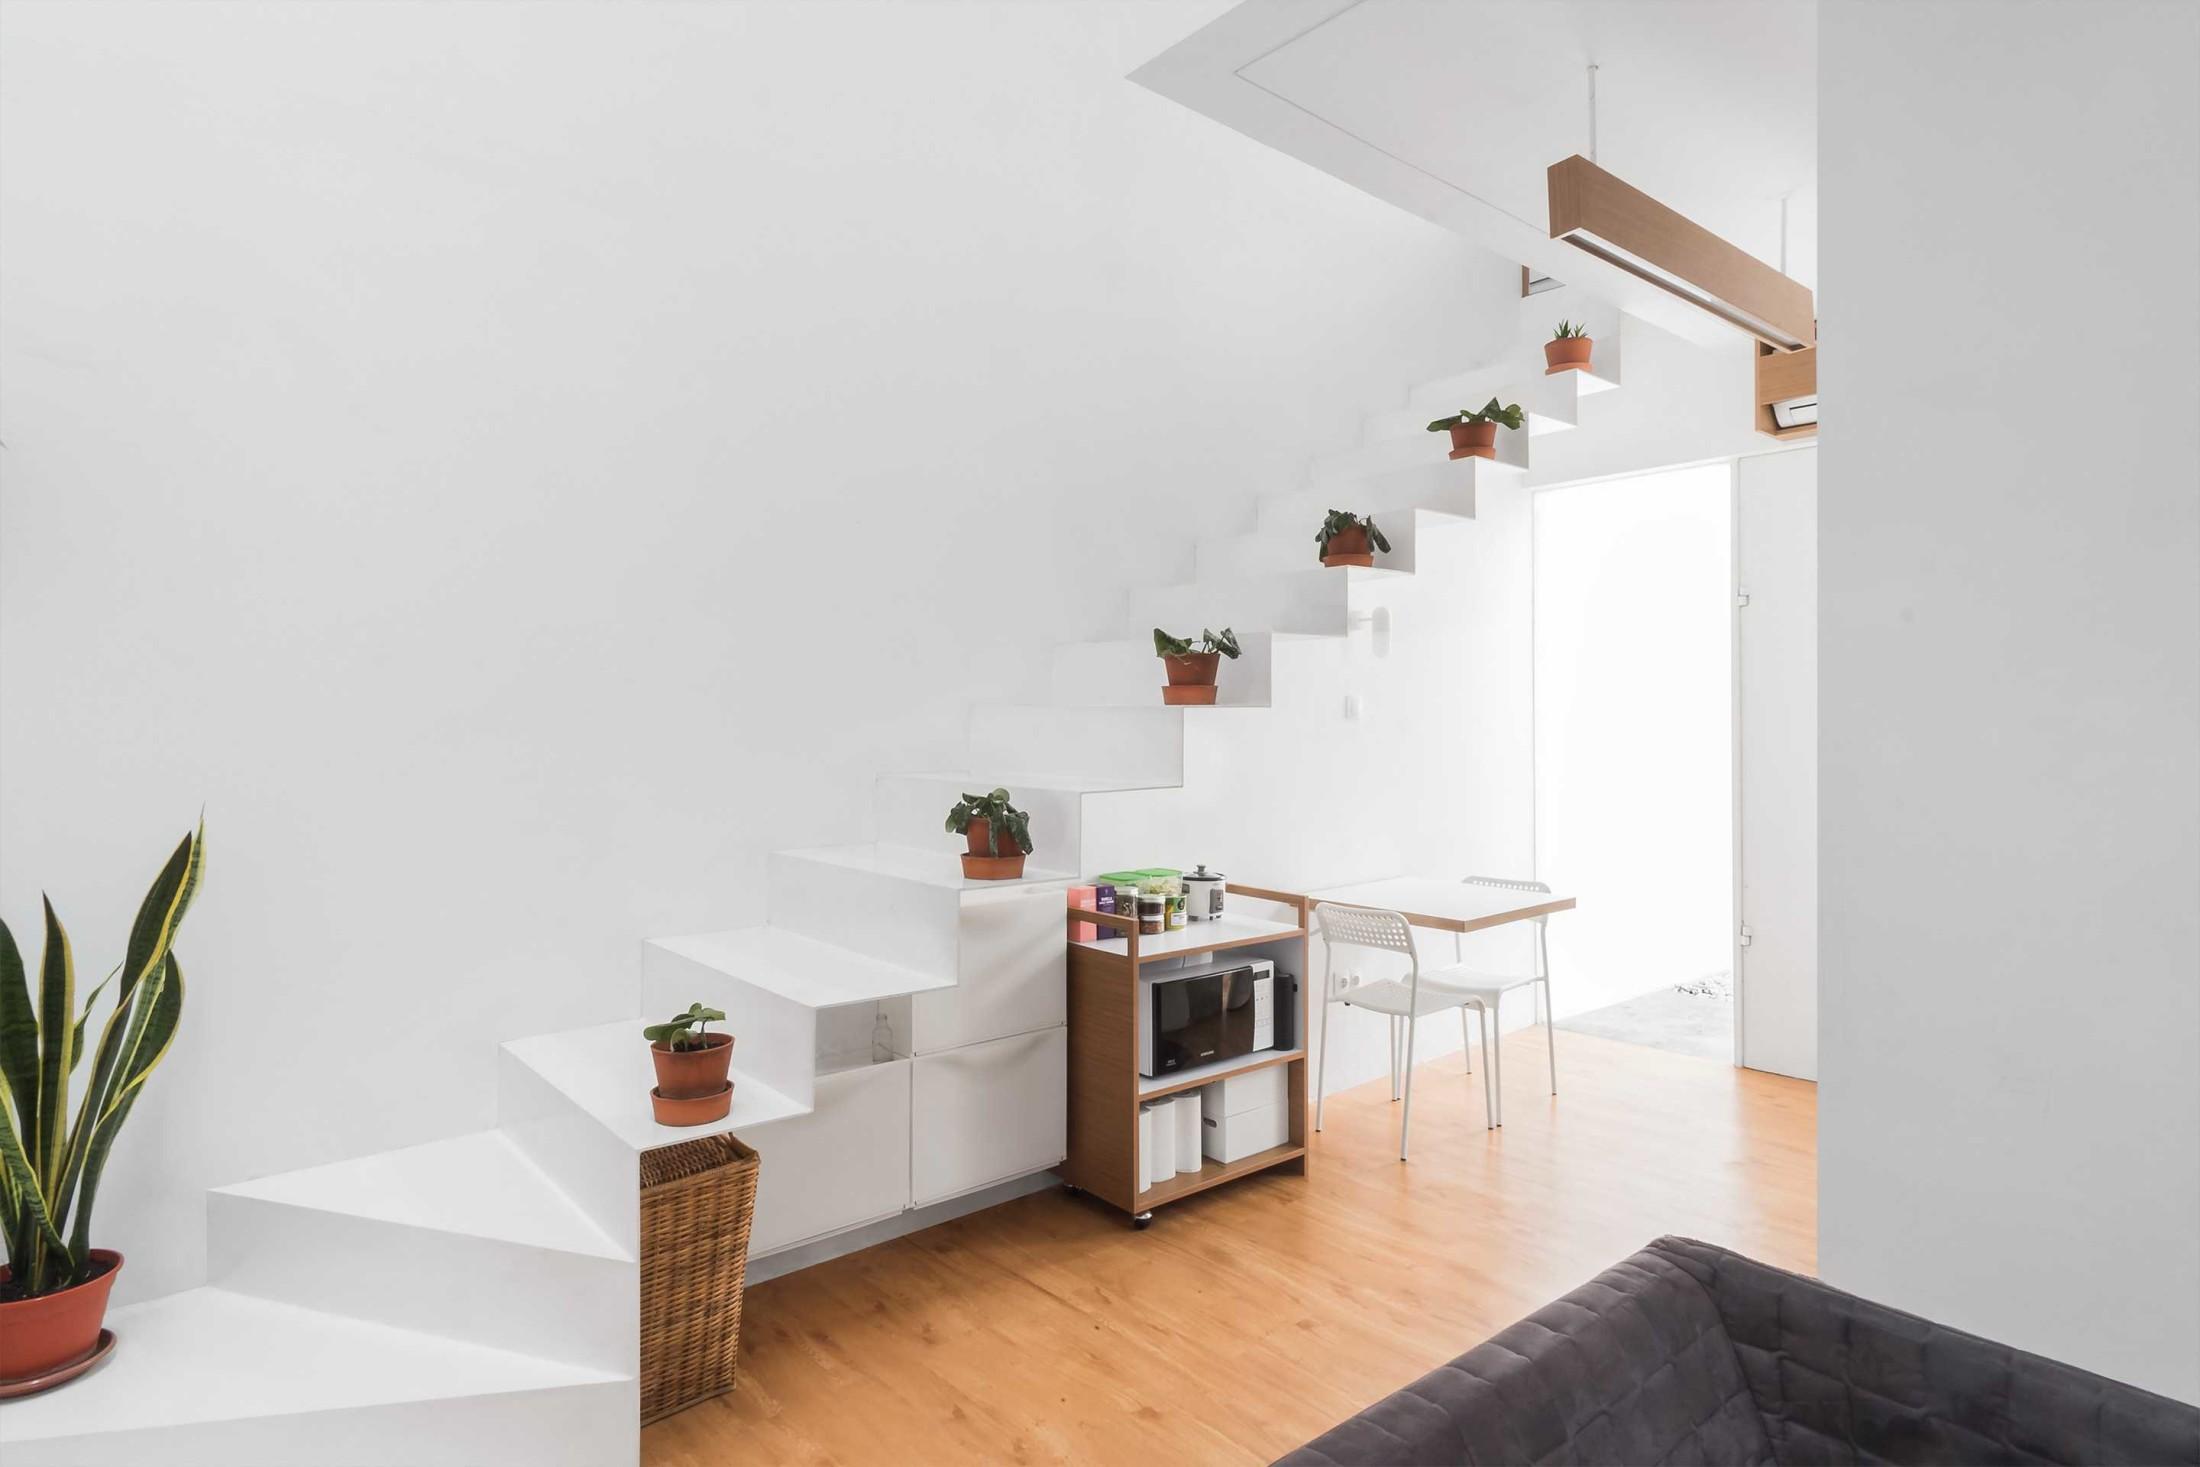 Rumah Minimalis Mungil Serba Putih Ala Dform Yang Penuh Ketenangan Arsitag